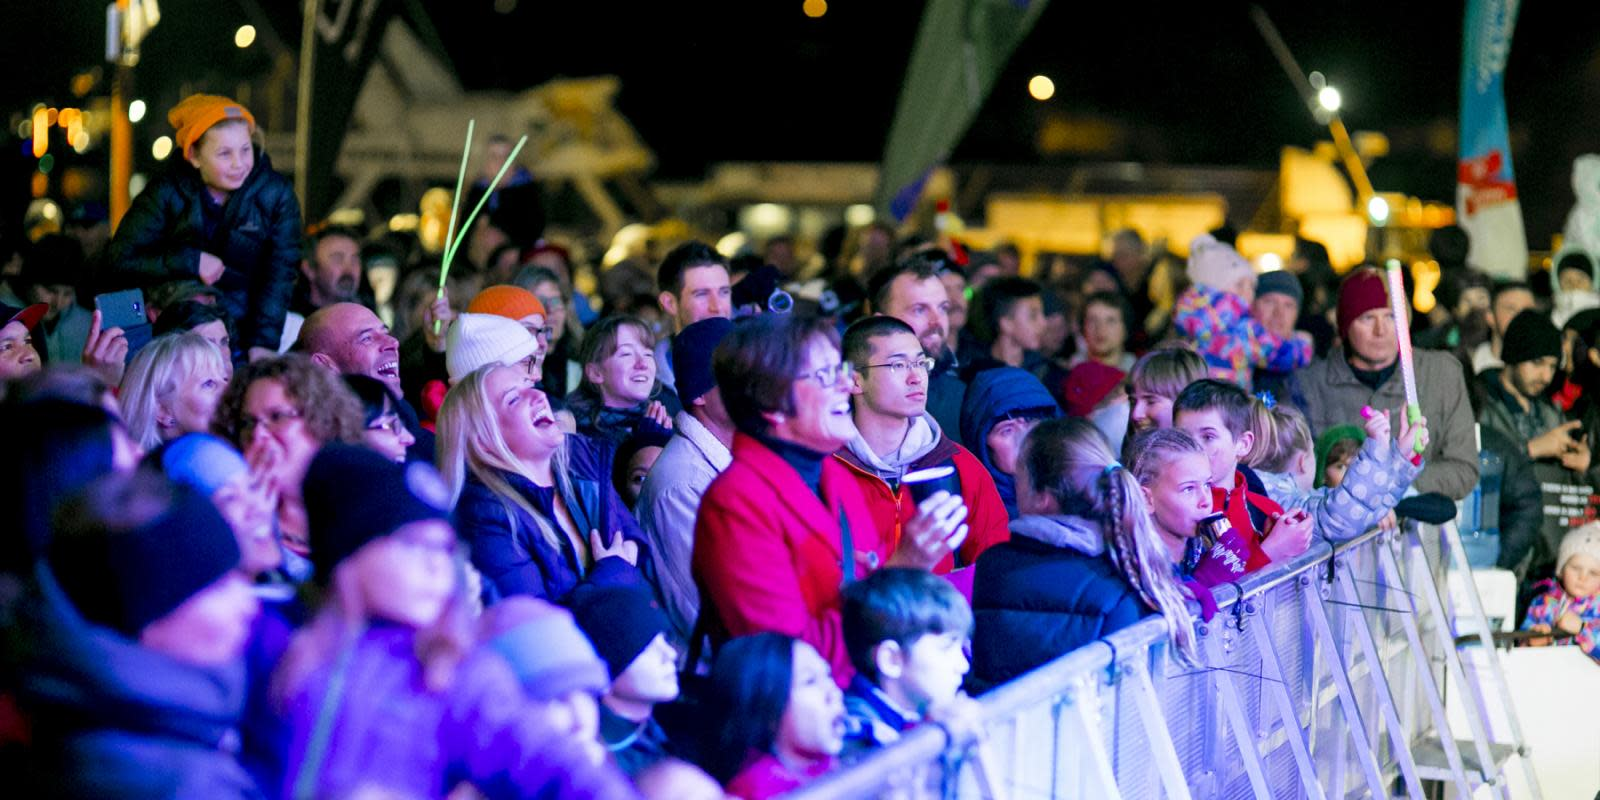 Loving-Queenstown-Winter-Festival-NZ